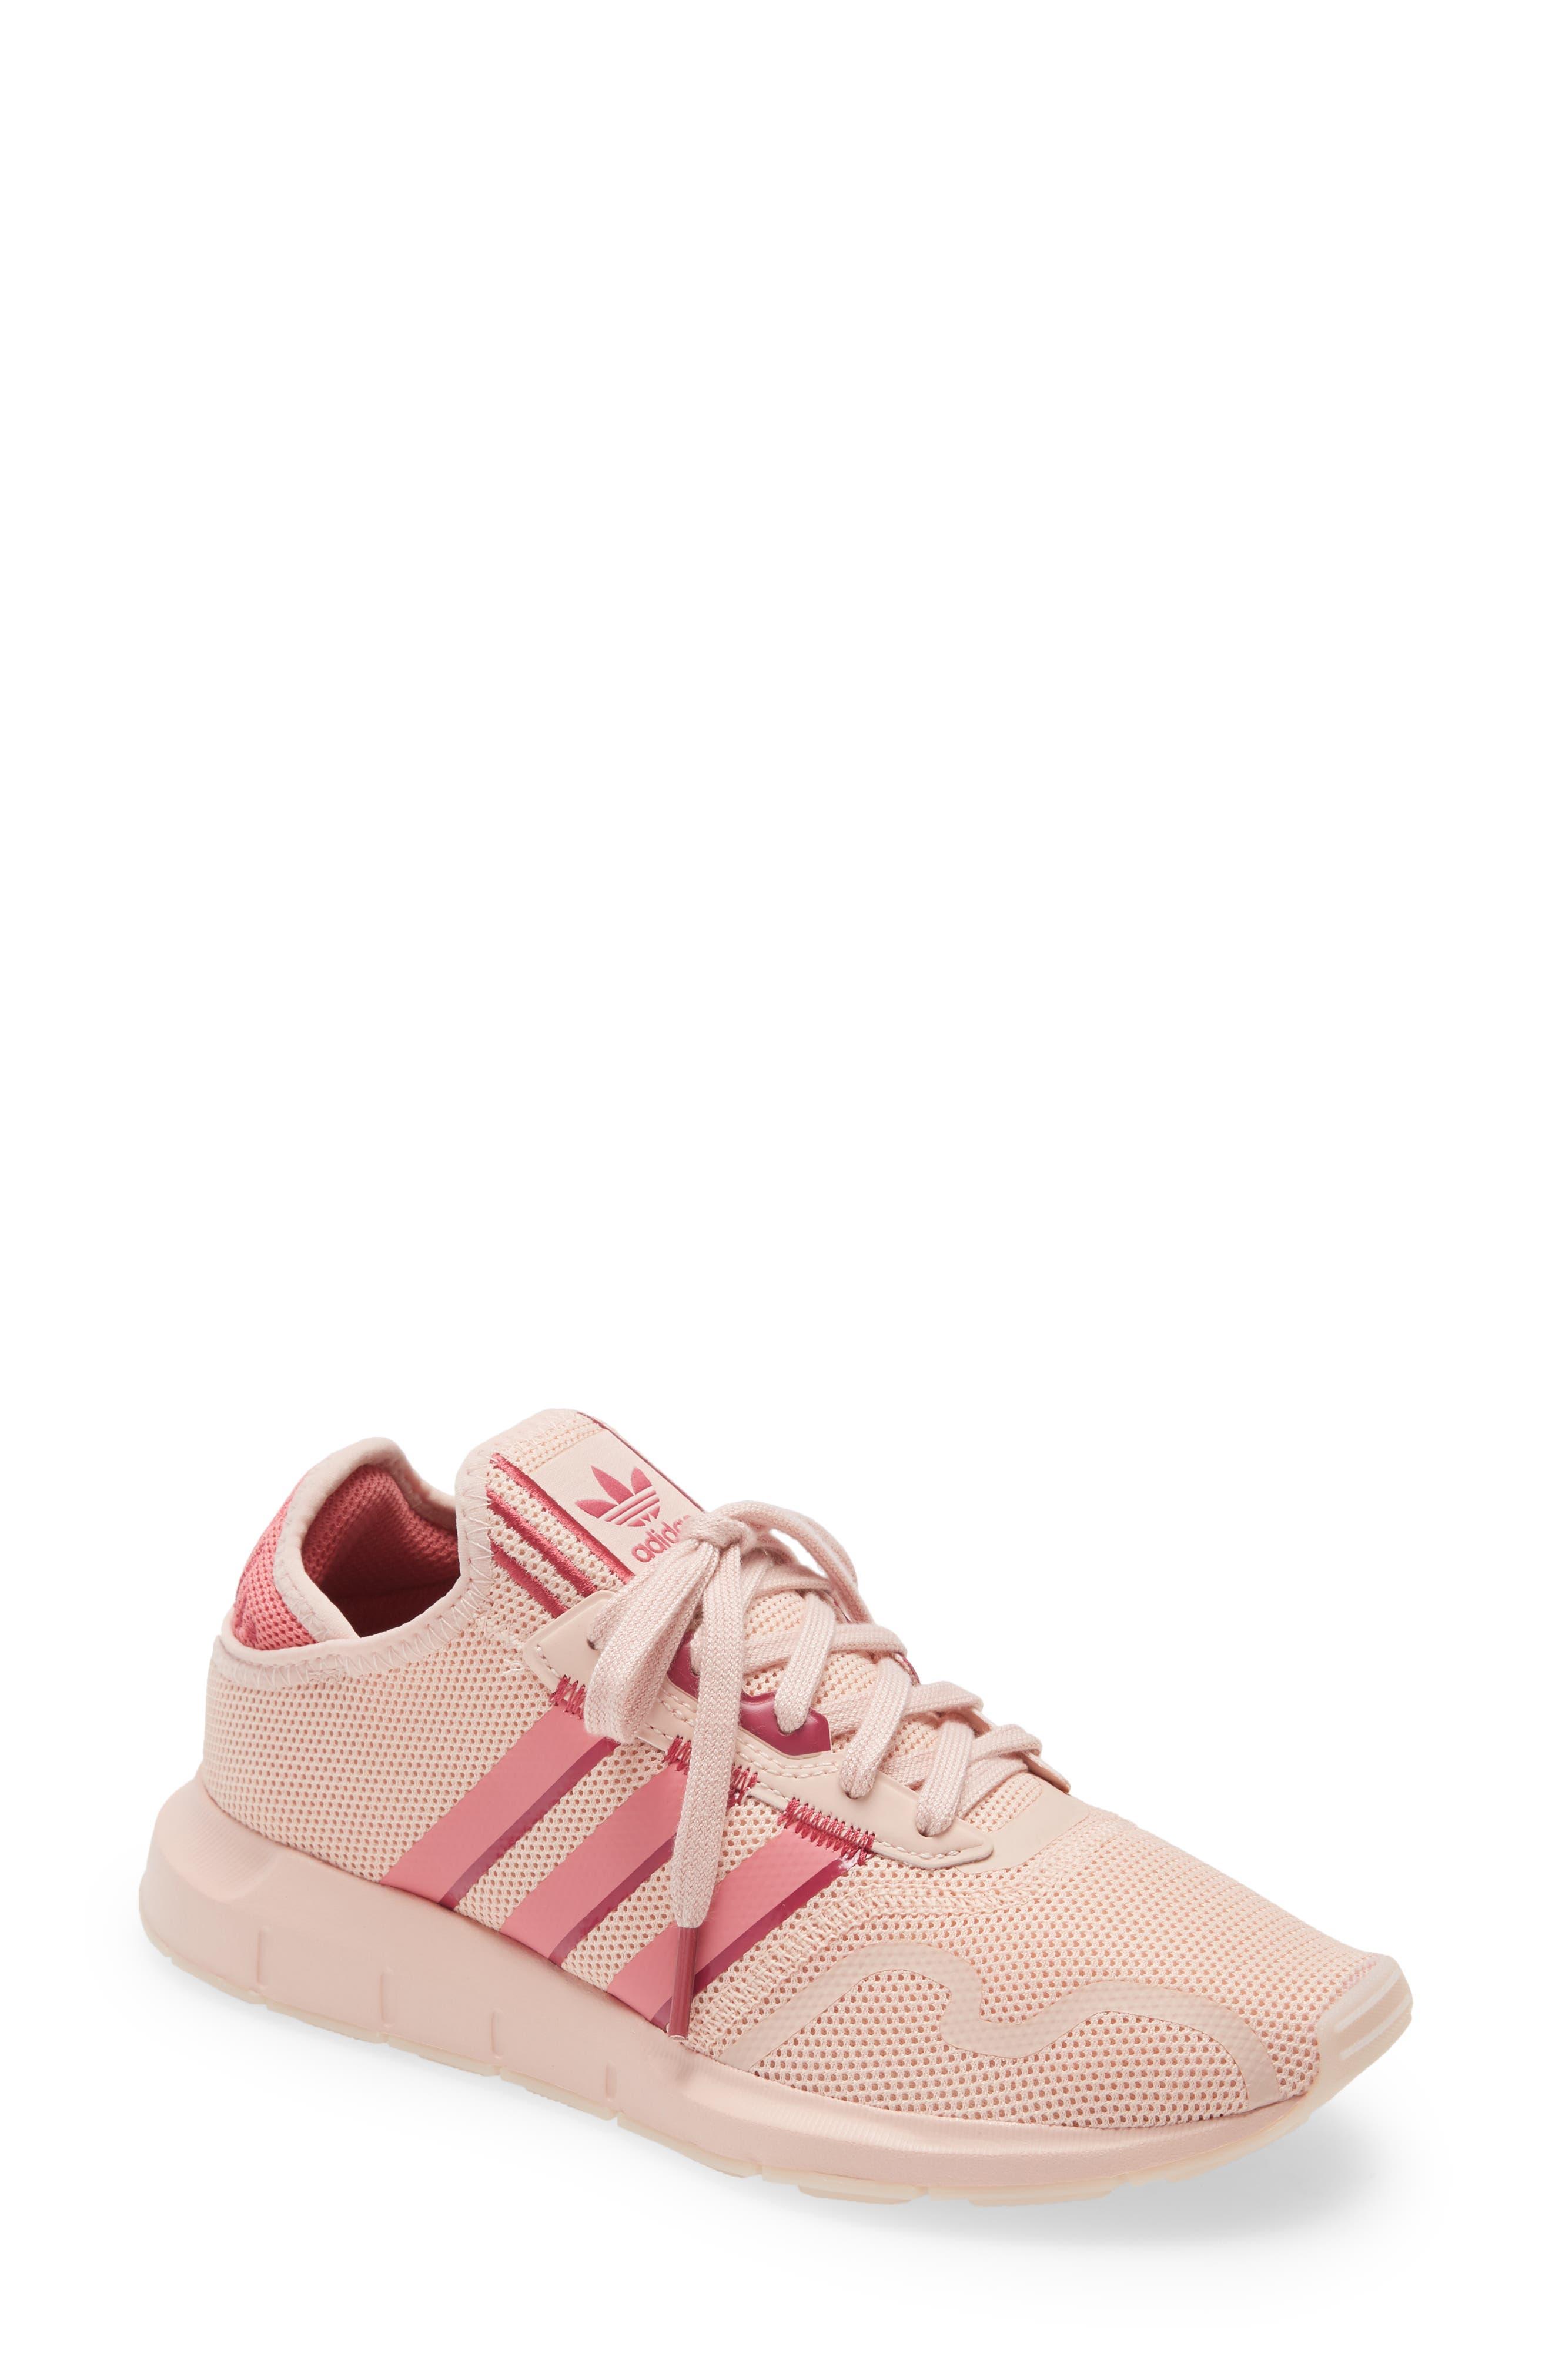 Pink Adidas | Nordstrom